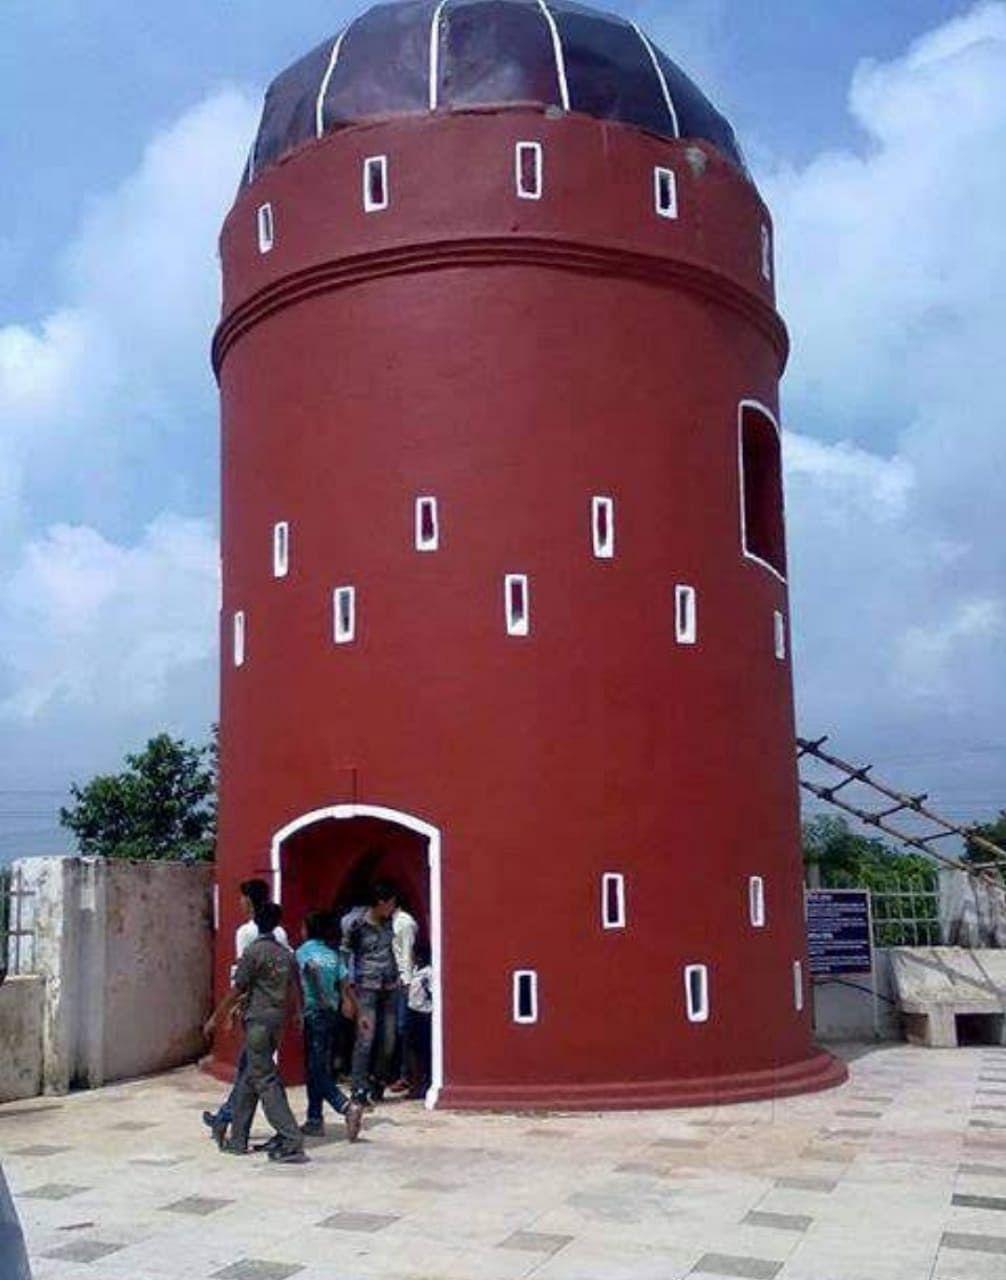 सौंदर्यीकरण के बाद का मार्टेलो टावर.